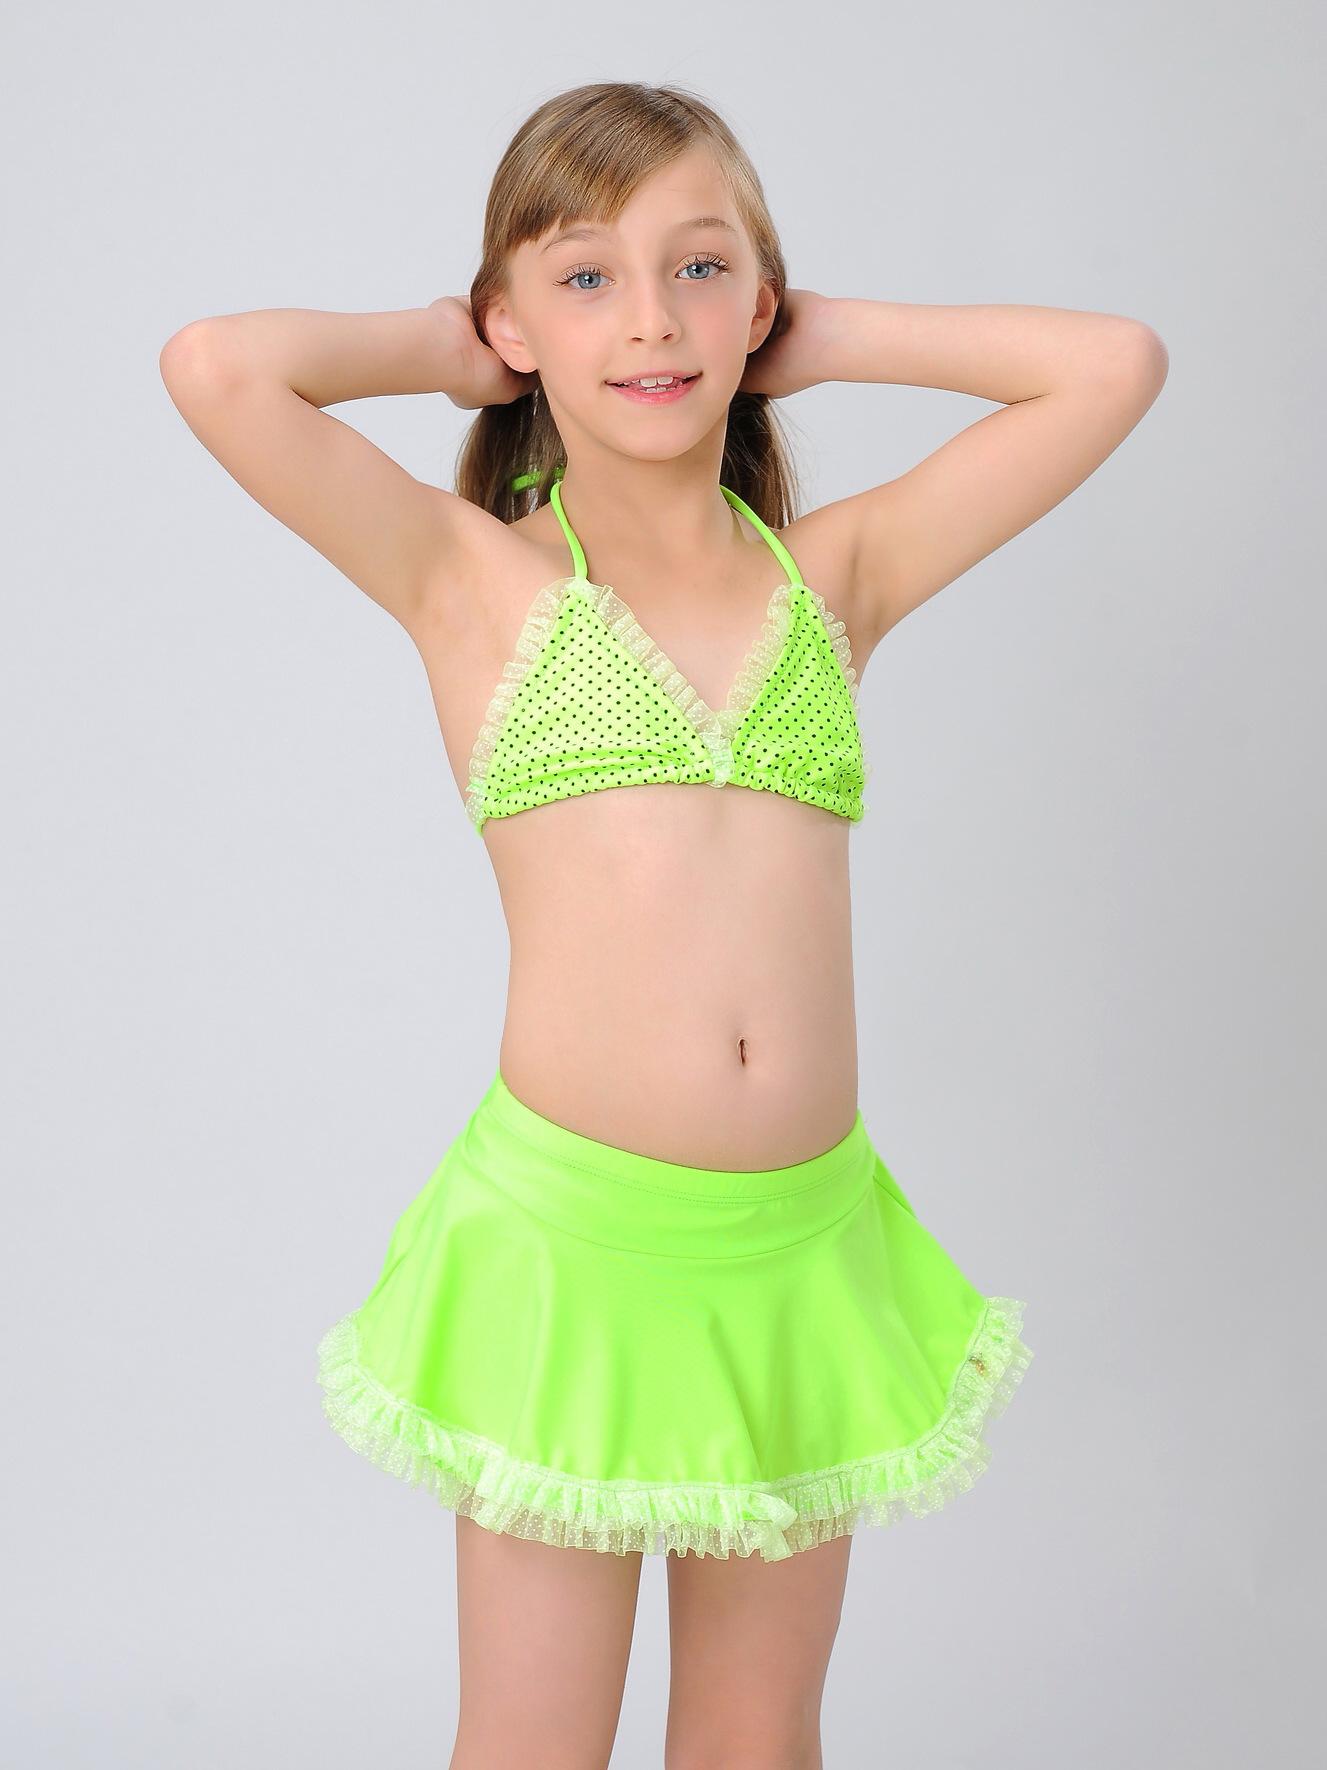 child models swimsuit images